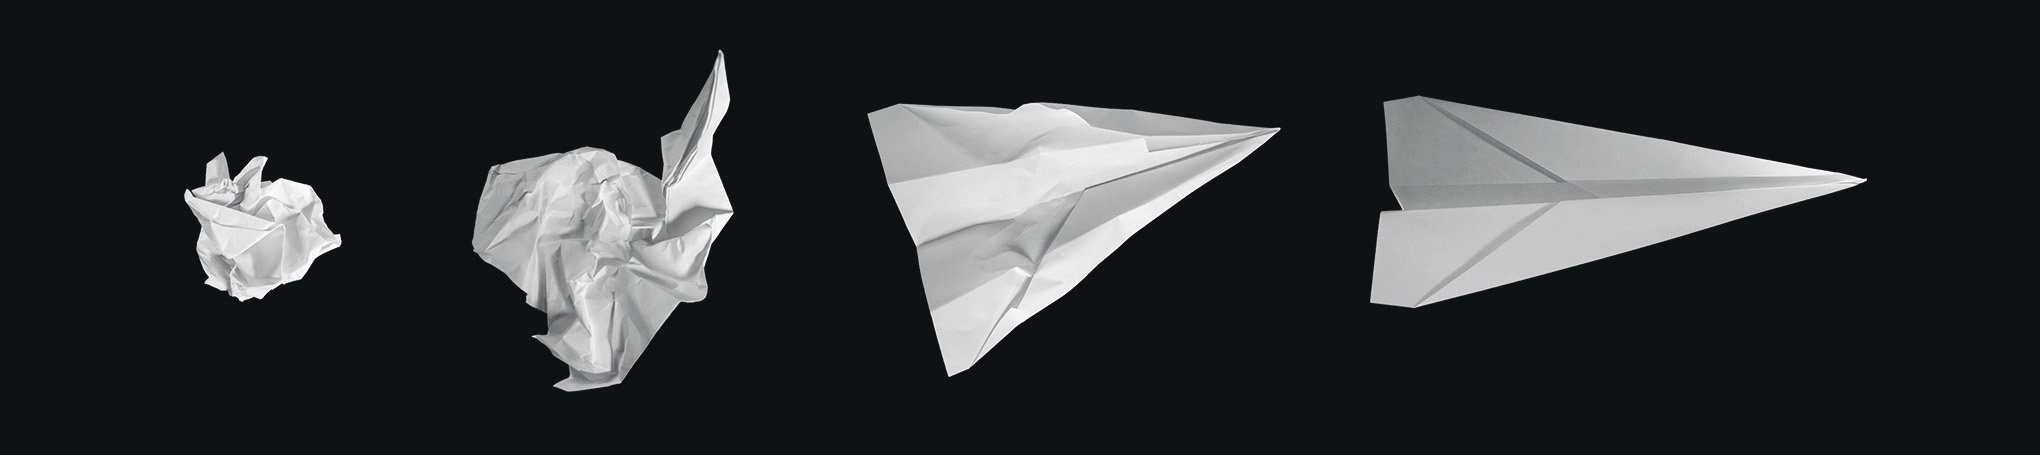 404-Paper-Airplanes-Black-2